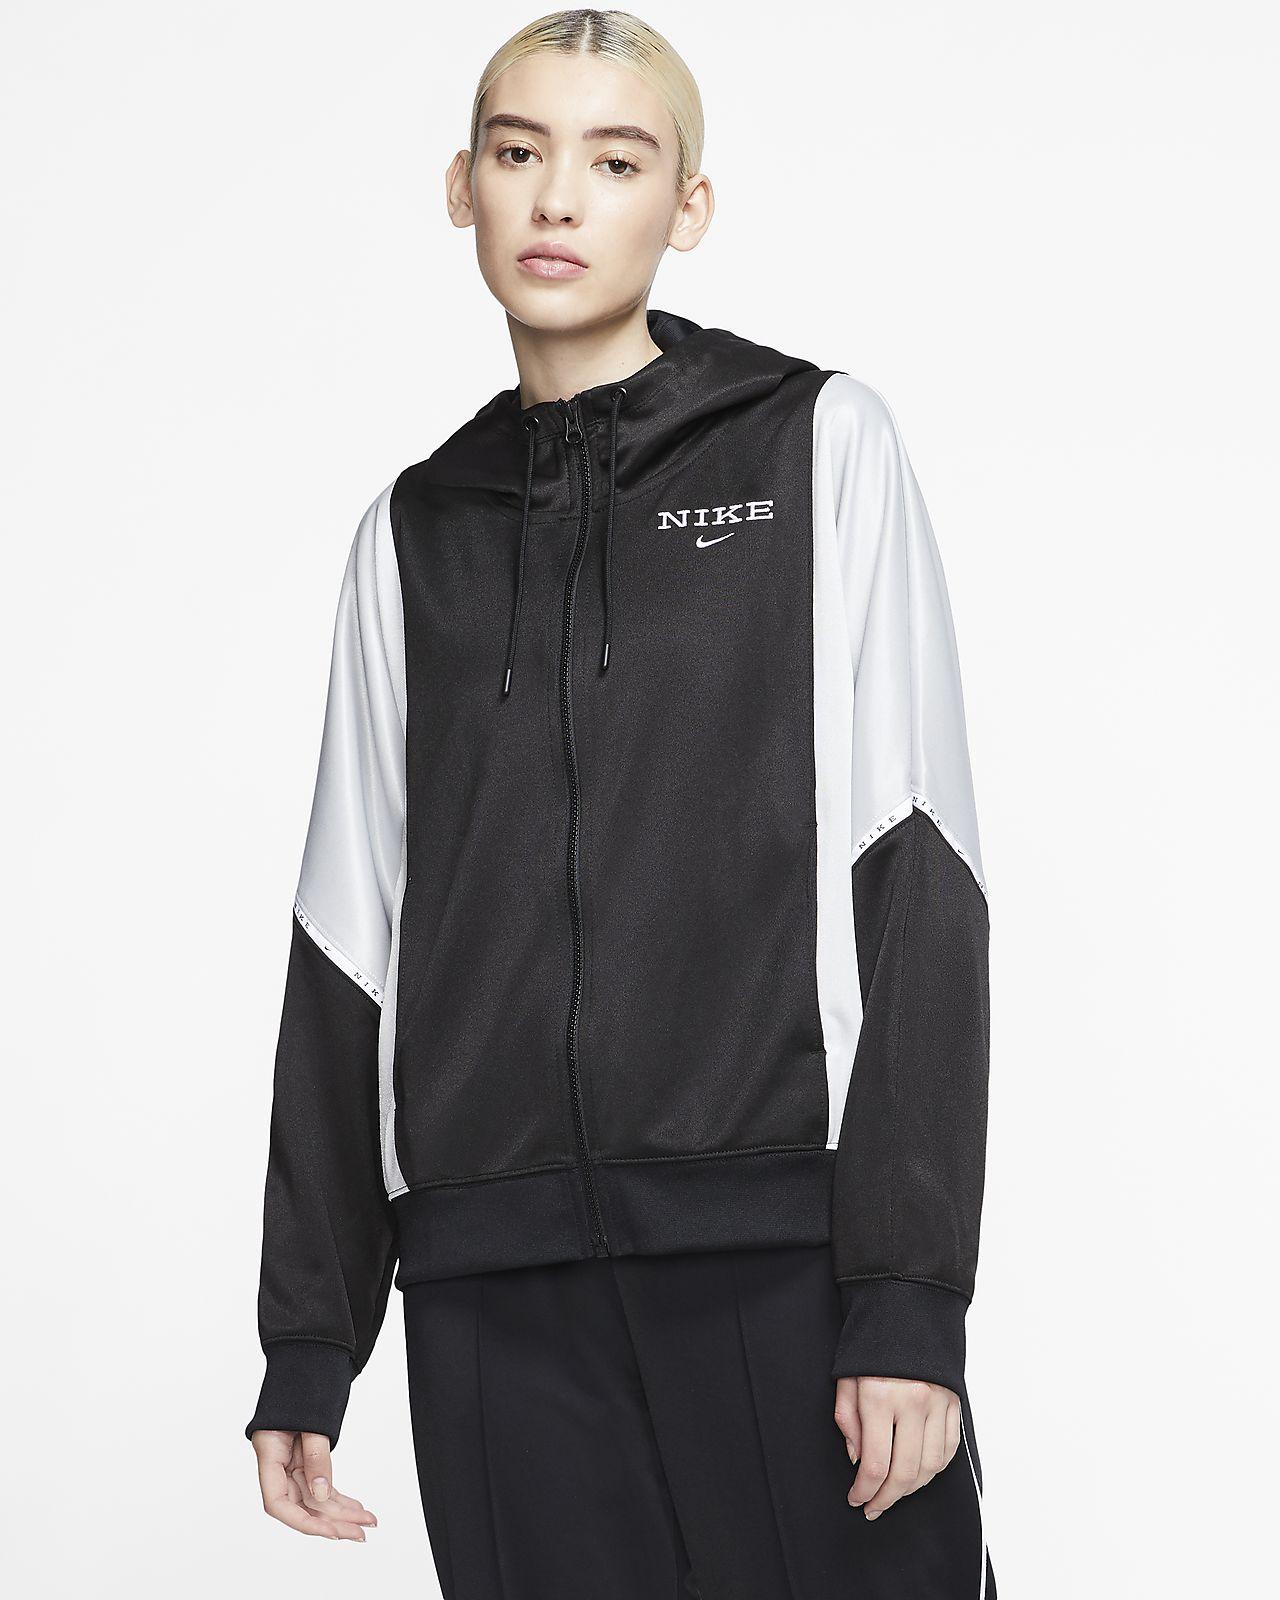 Nike Sportswear 女子全长拉链开襟连帽夹克